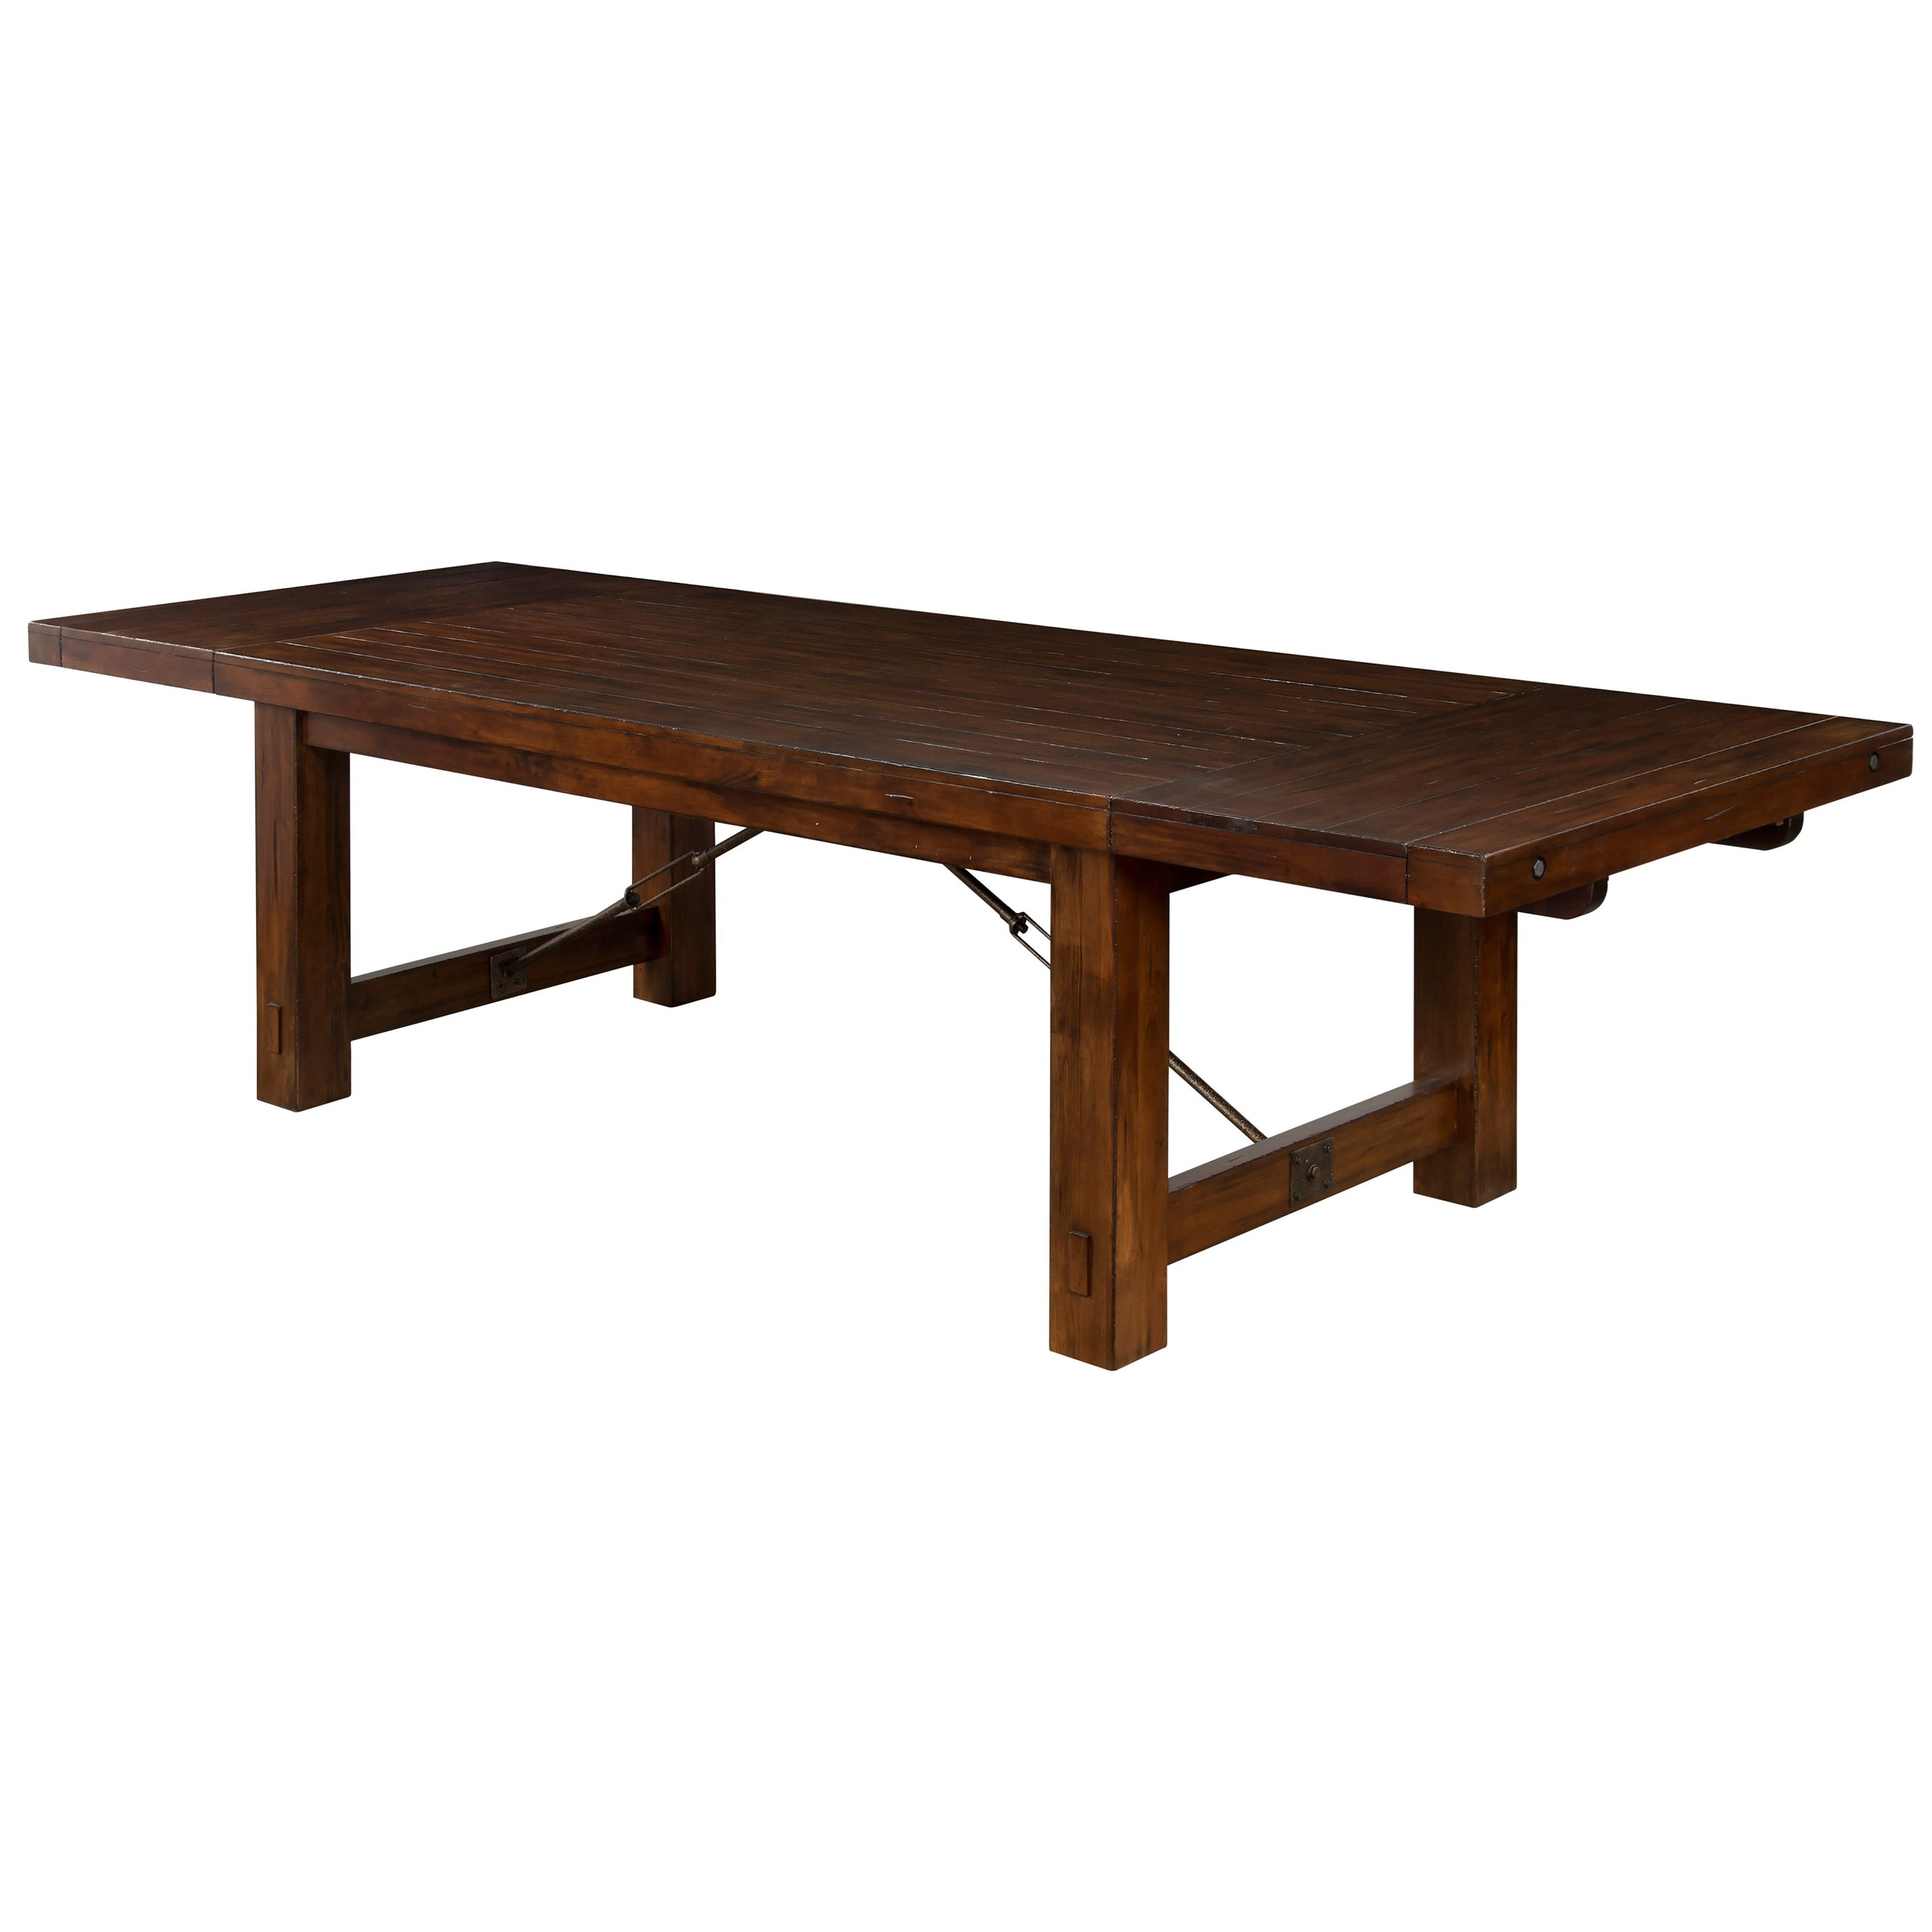 Sunny Designs Tuscany Distressed Mahogany Extension Table